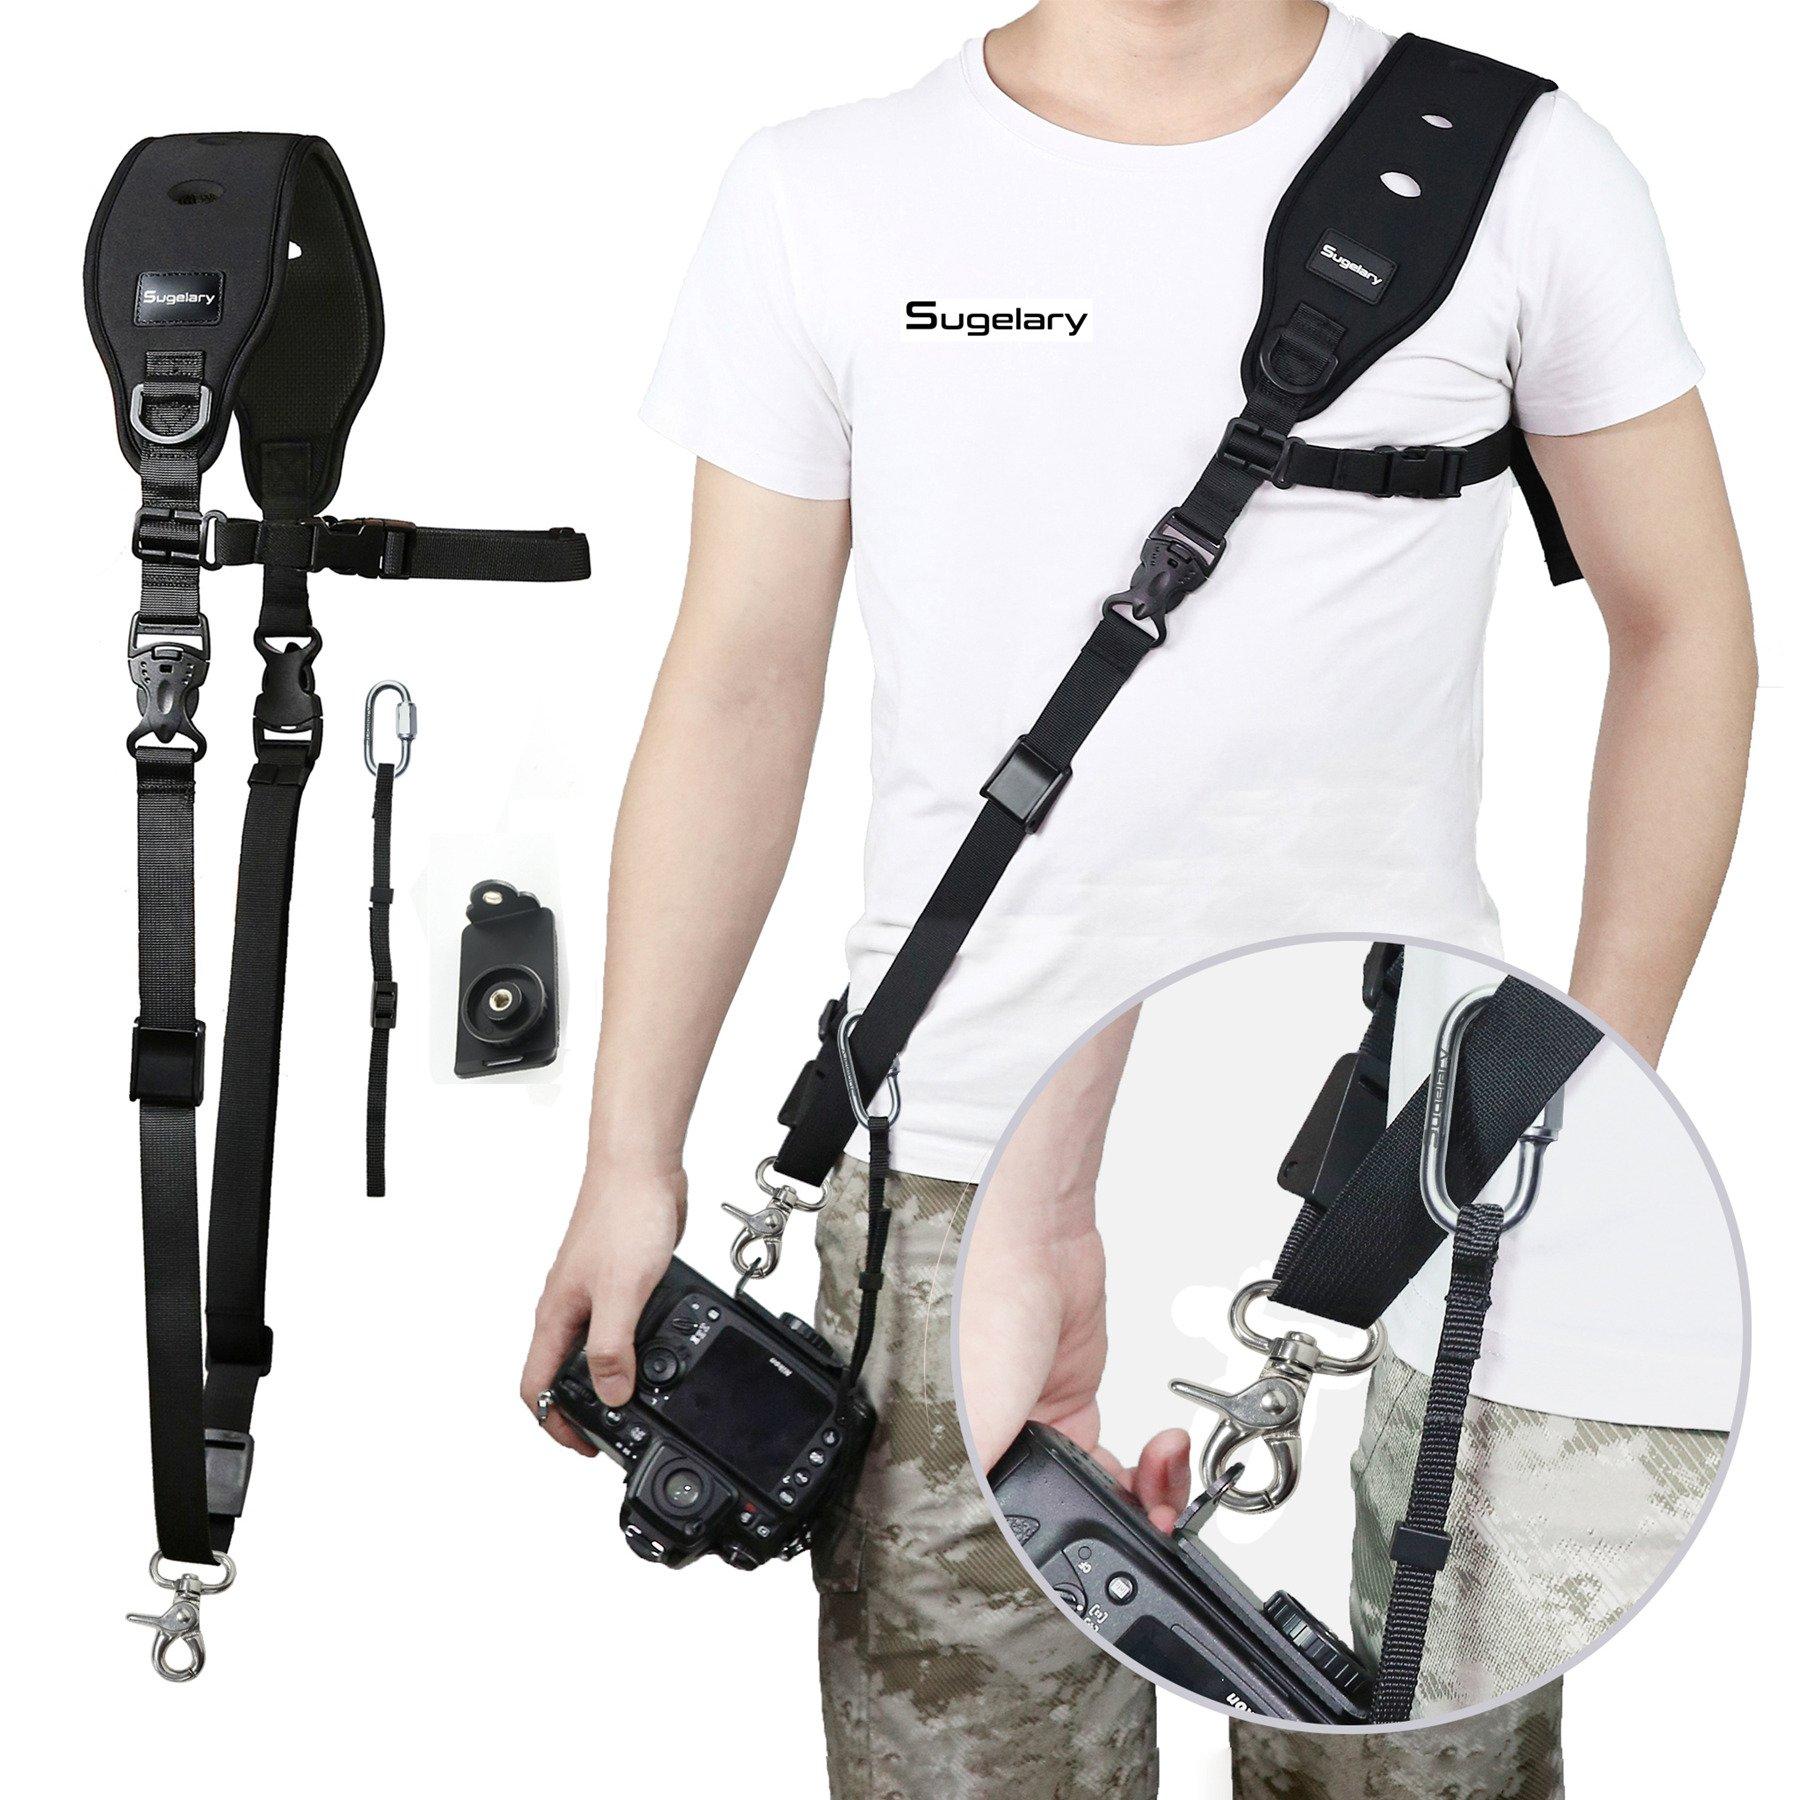 Camera Strap, Sugelary Camera DSLR Shoulder Neck Strap for Canon Nikon Sony DSLR SLR Mirrorless Camera …